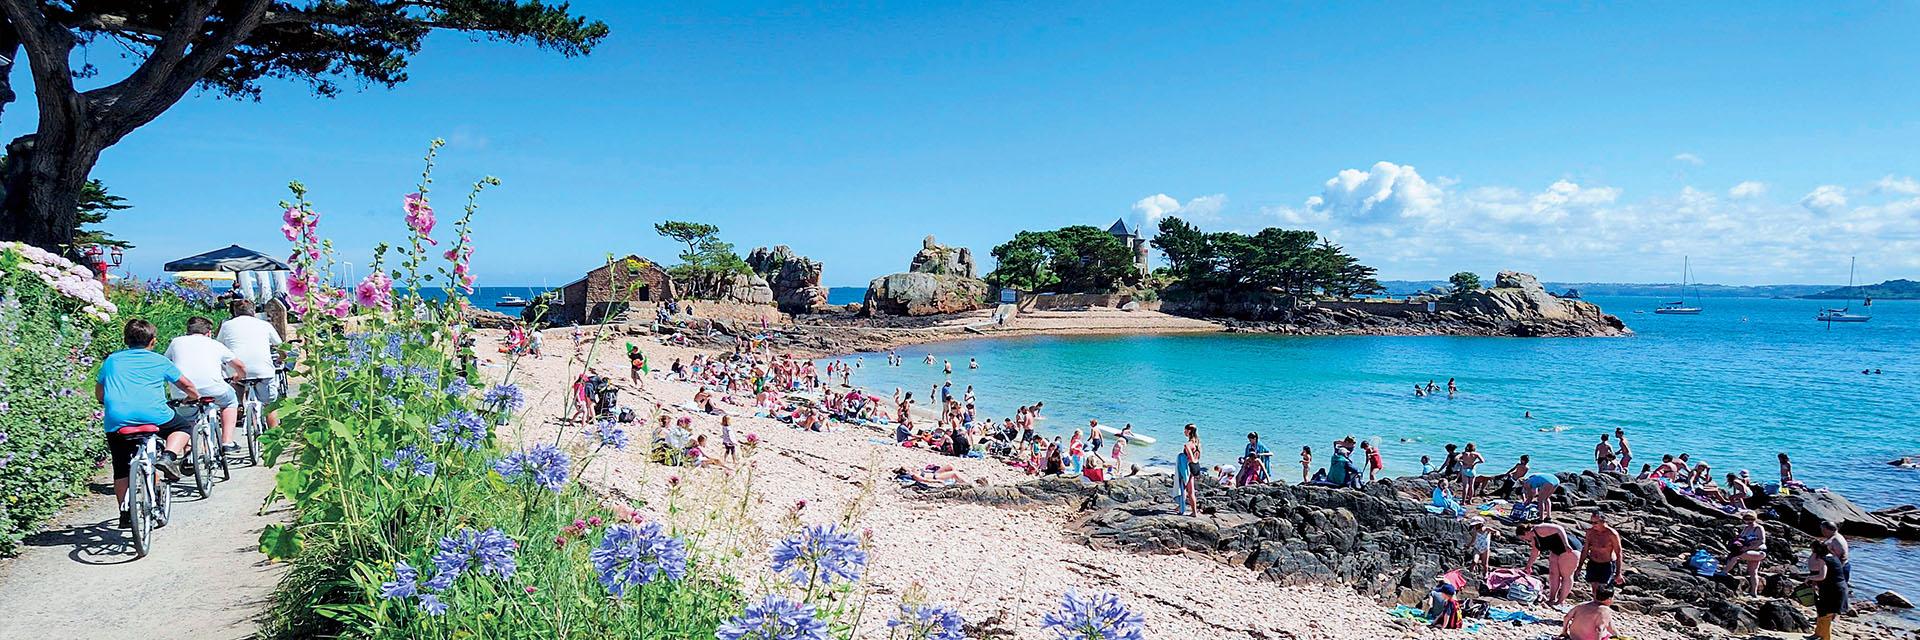 Village_club_vacances_bretagne-nord-roz-armor-plage